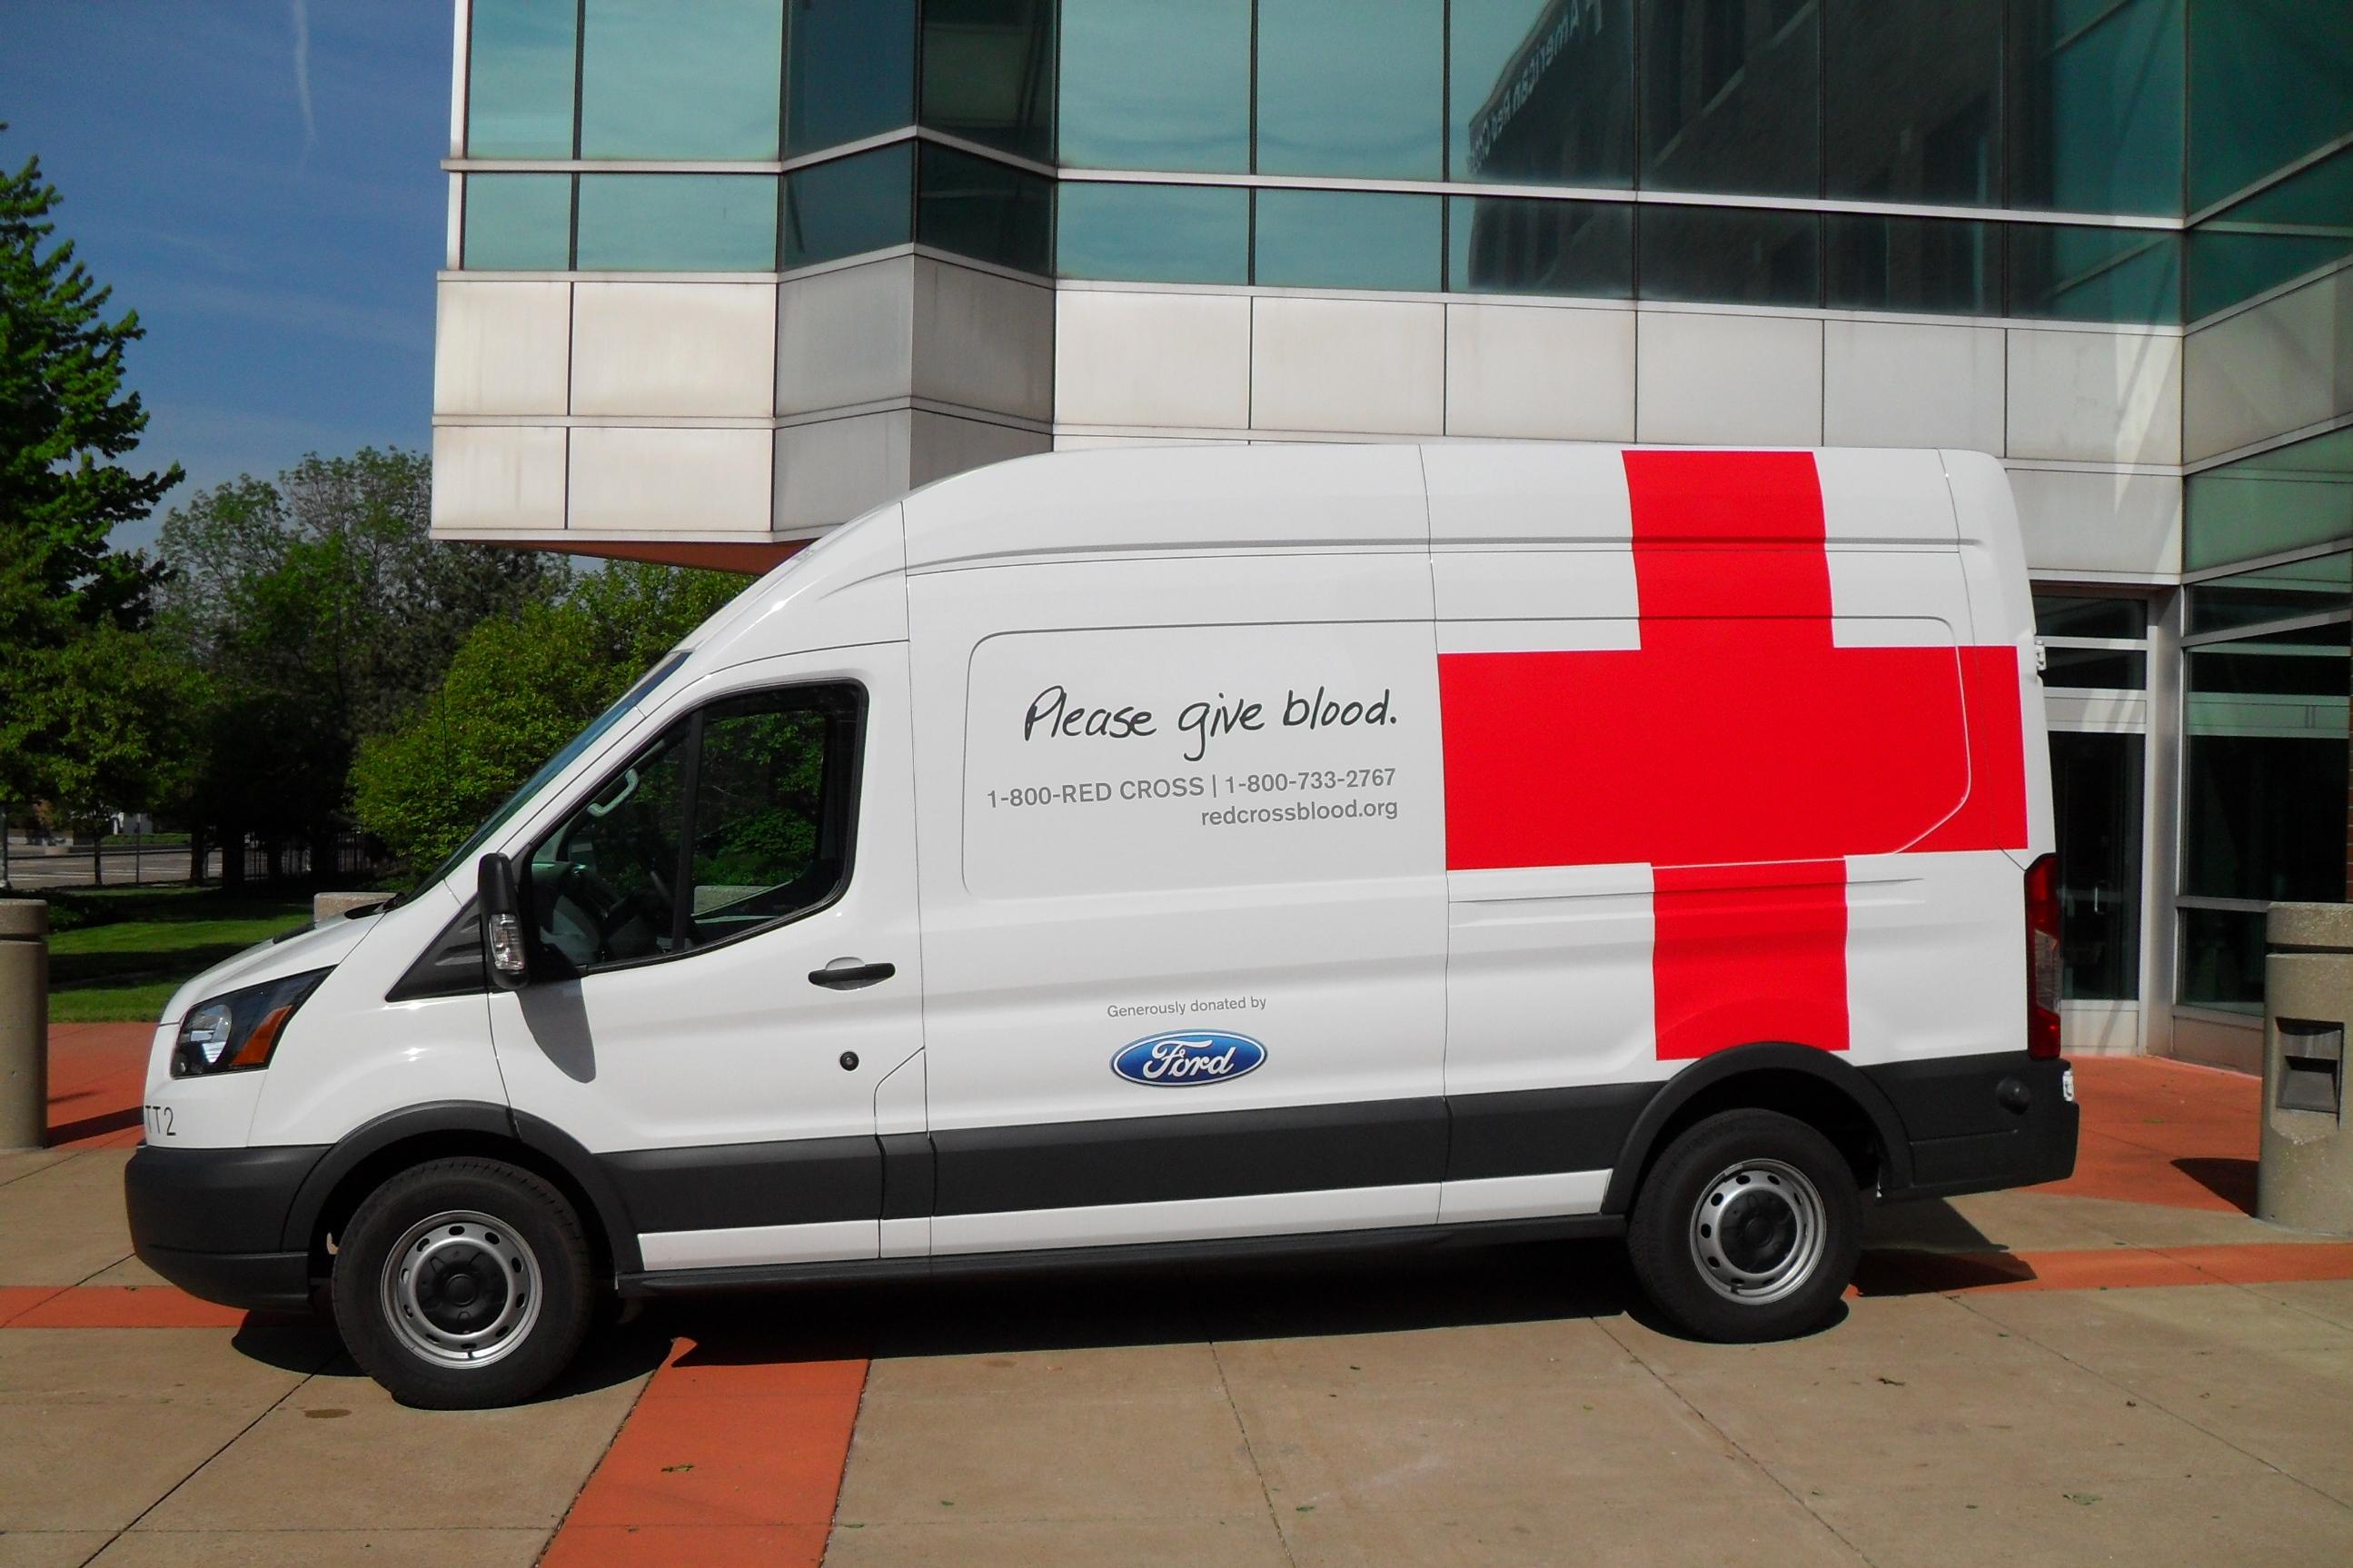 Ford Donates Transit Vans to Red Cross Fleet